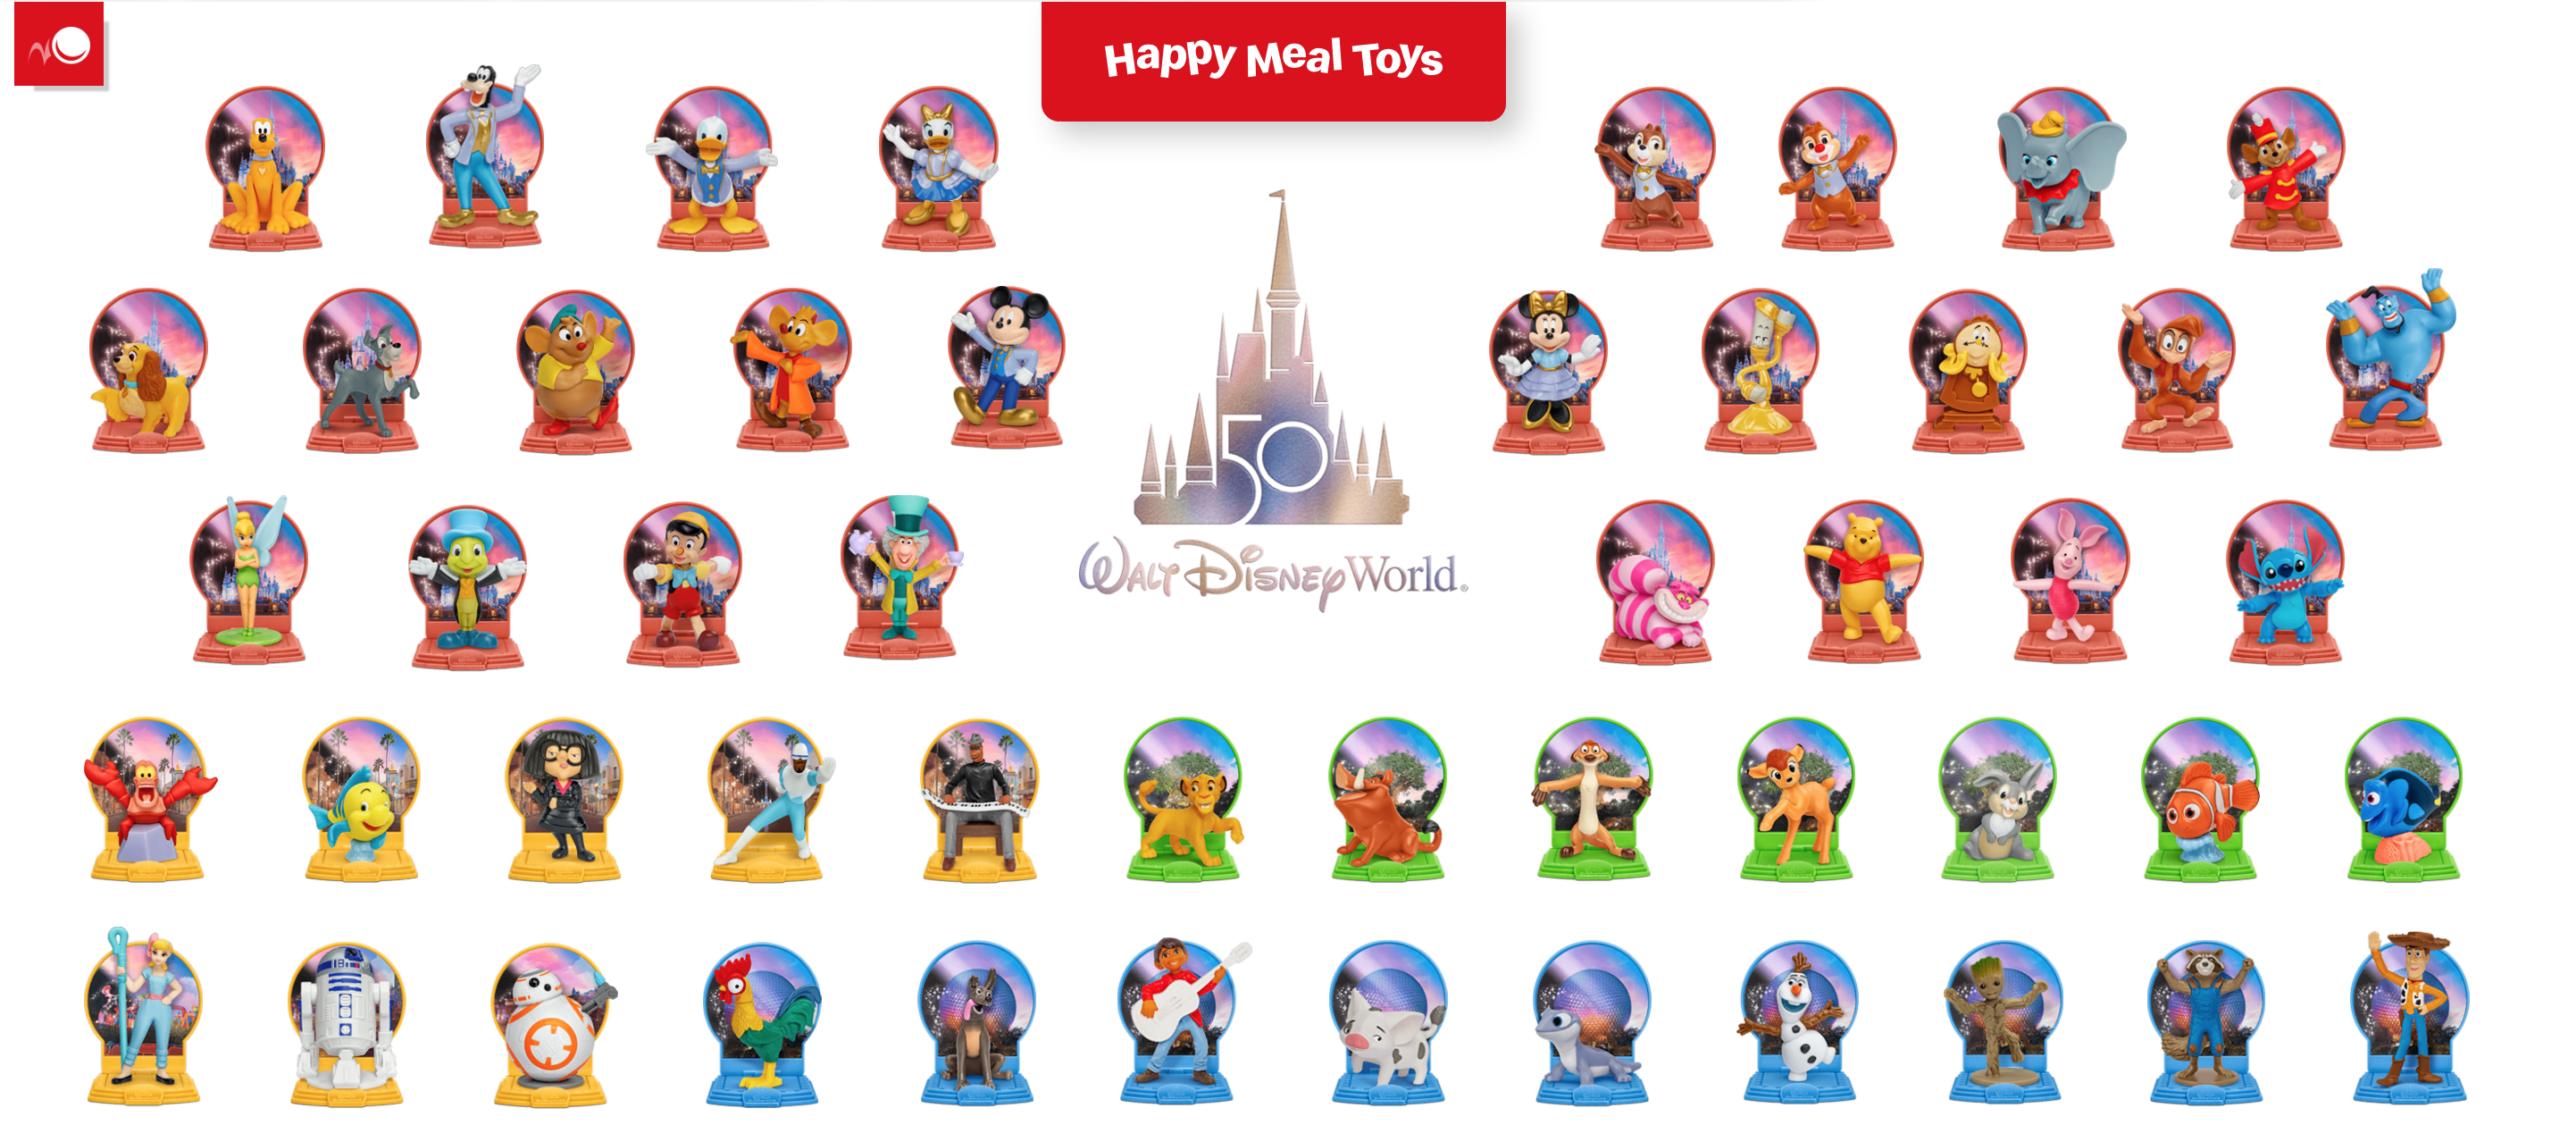 McDonald's 50th Anniversary Disney Toys List